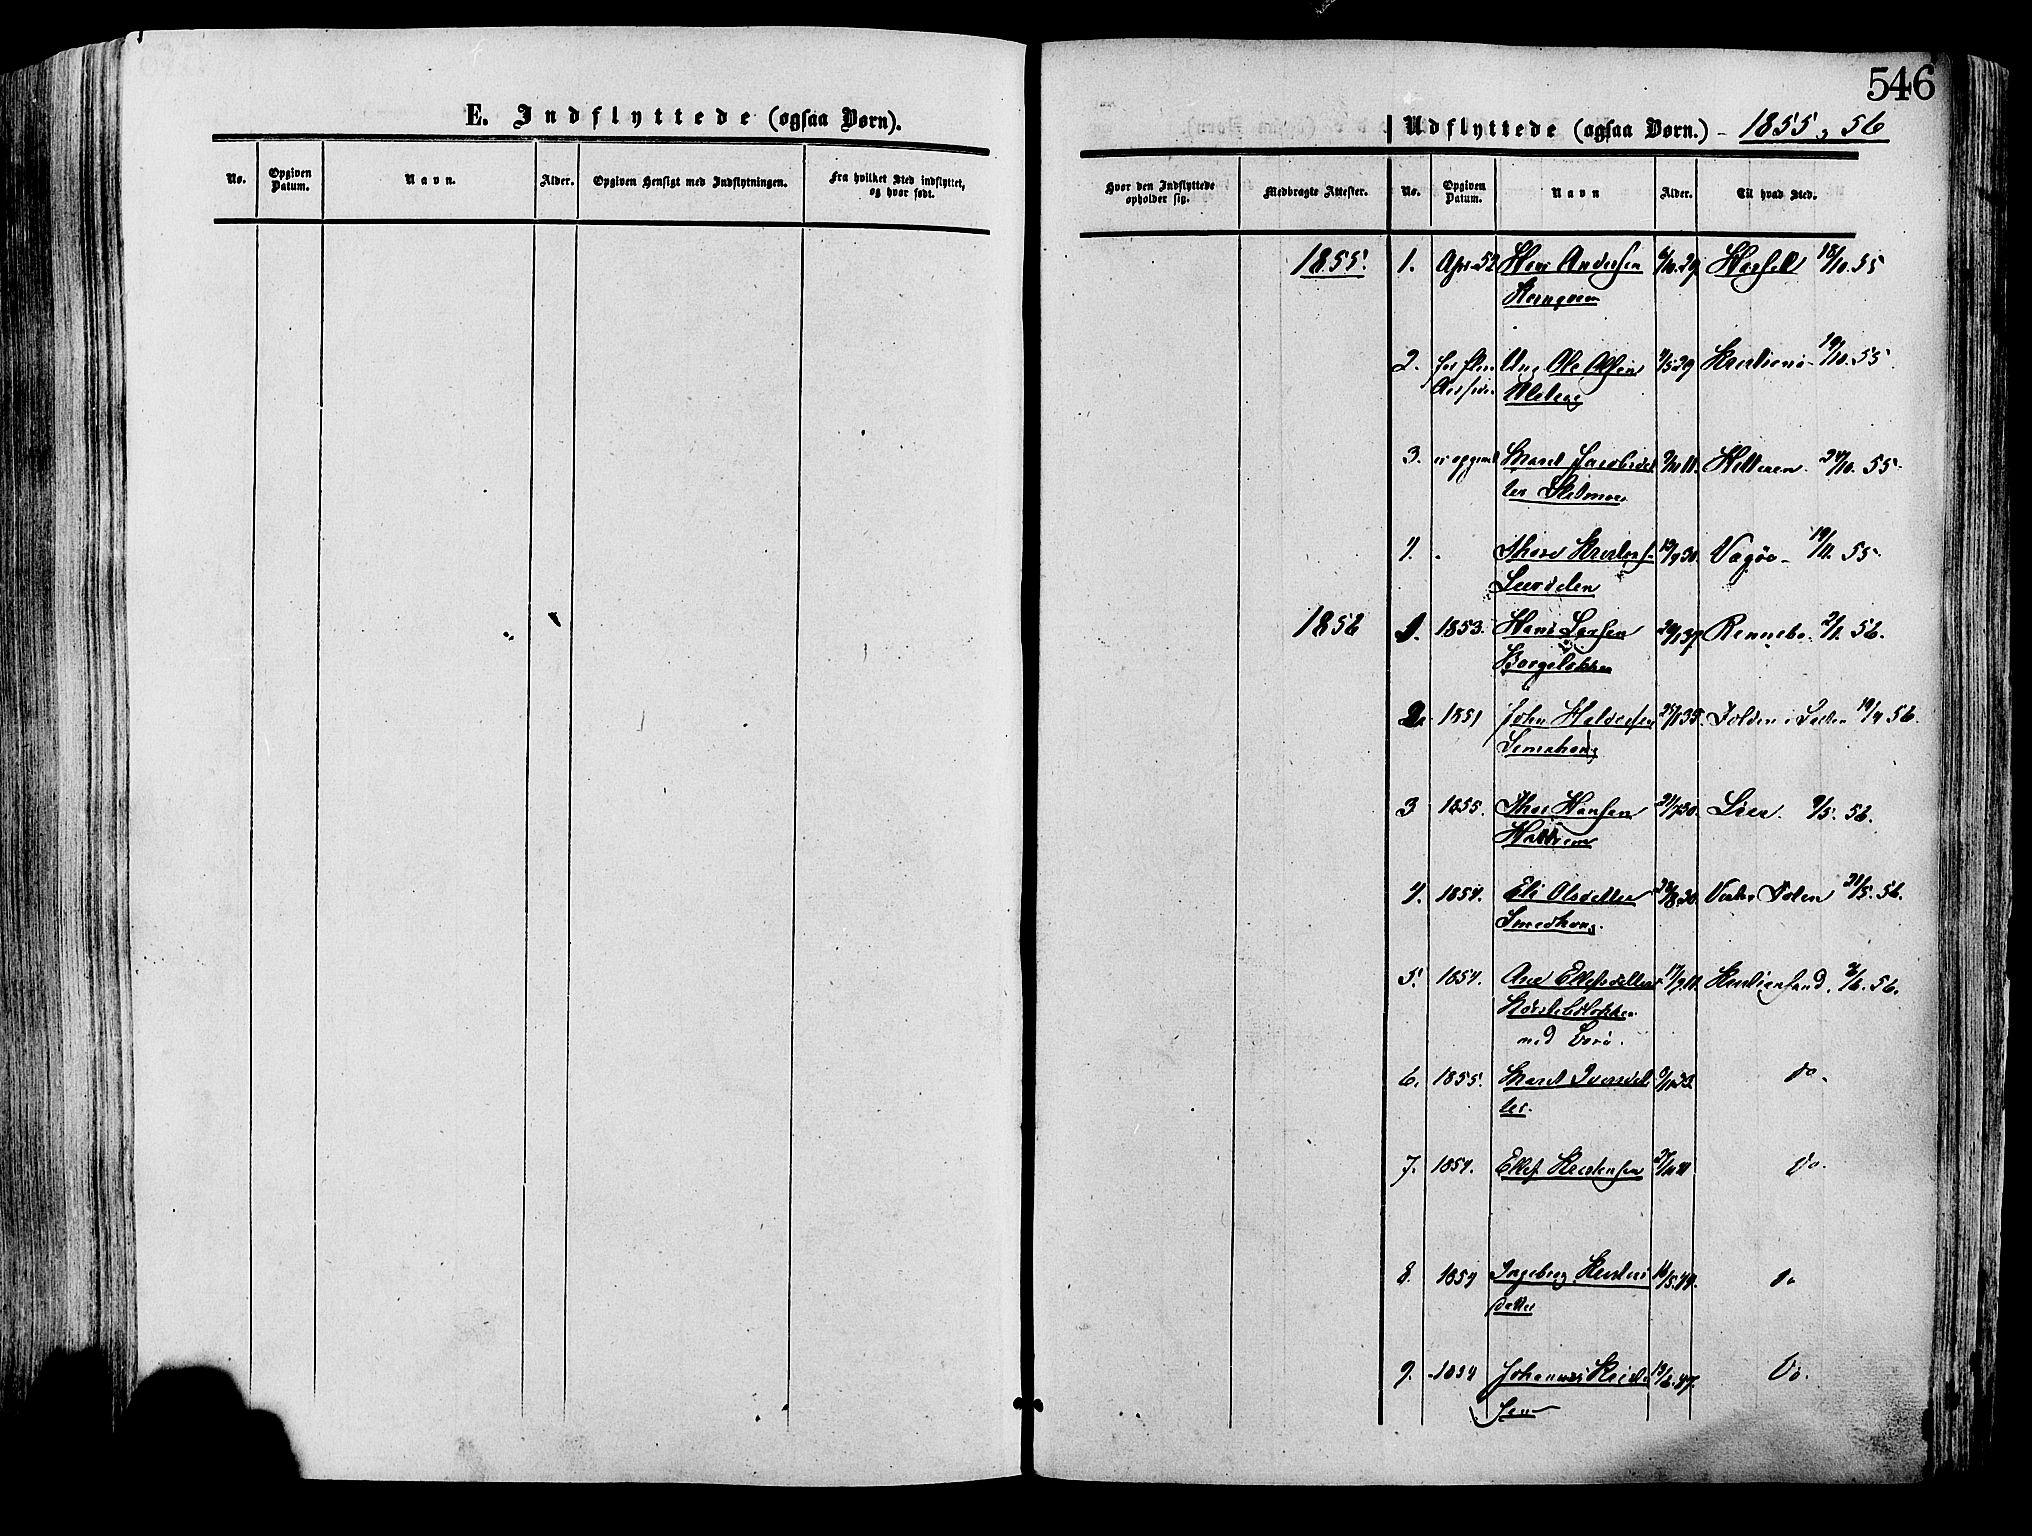 SAH, Lesja prestekontor, Ministerialbok nr. 8, 1854-1880, s. 546